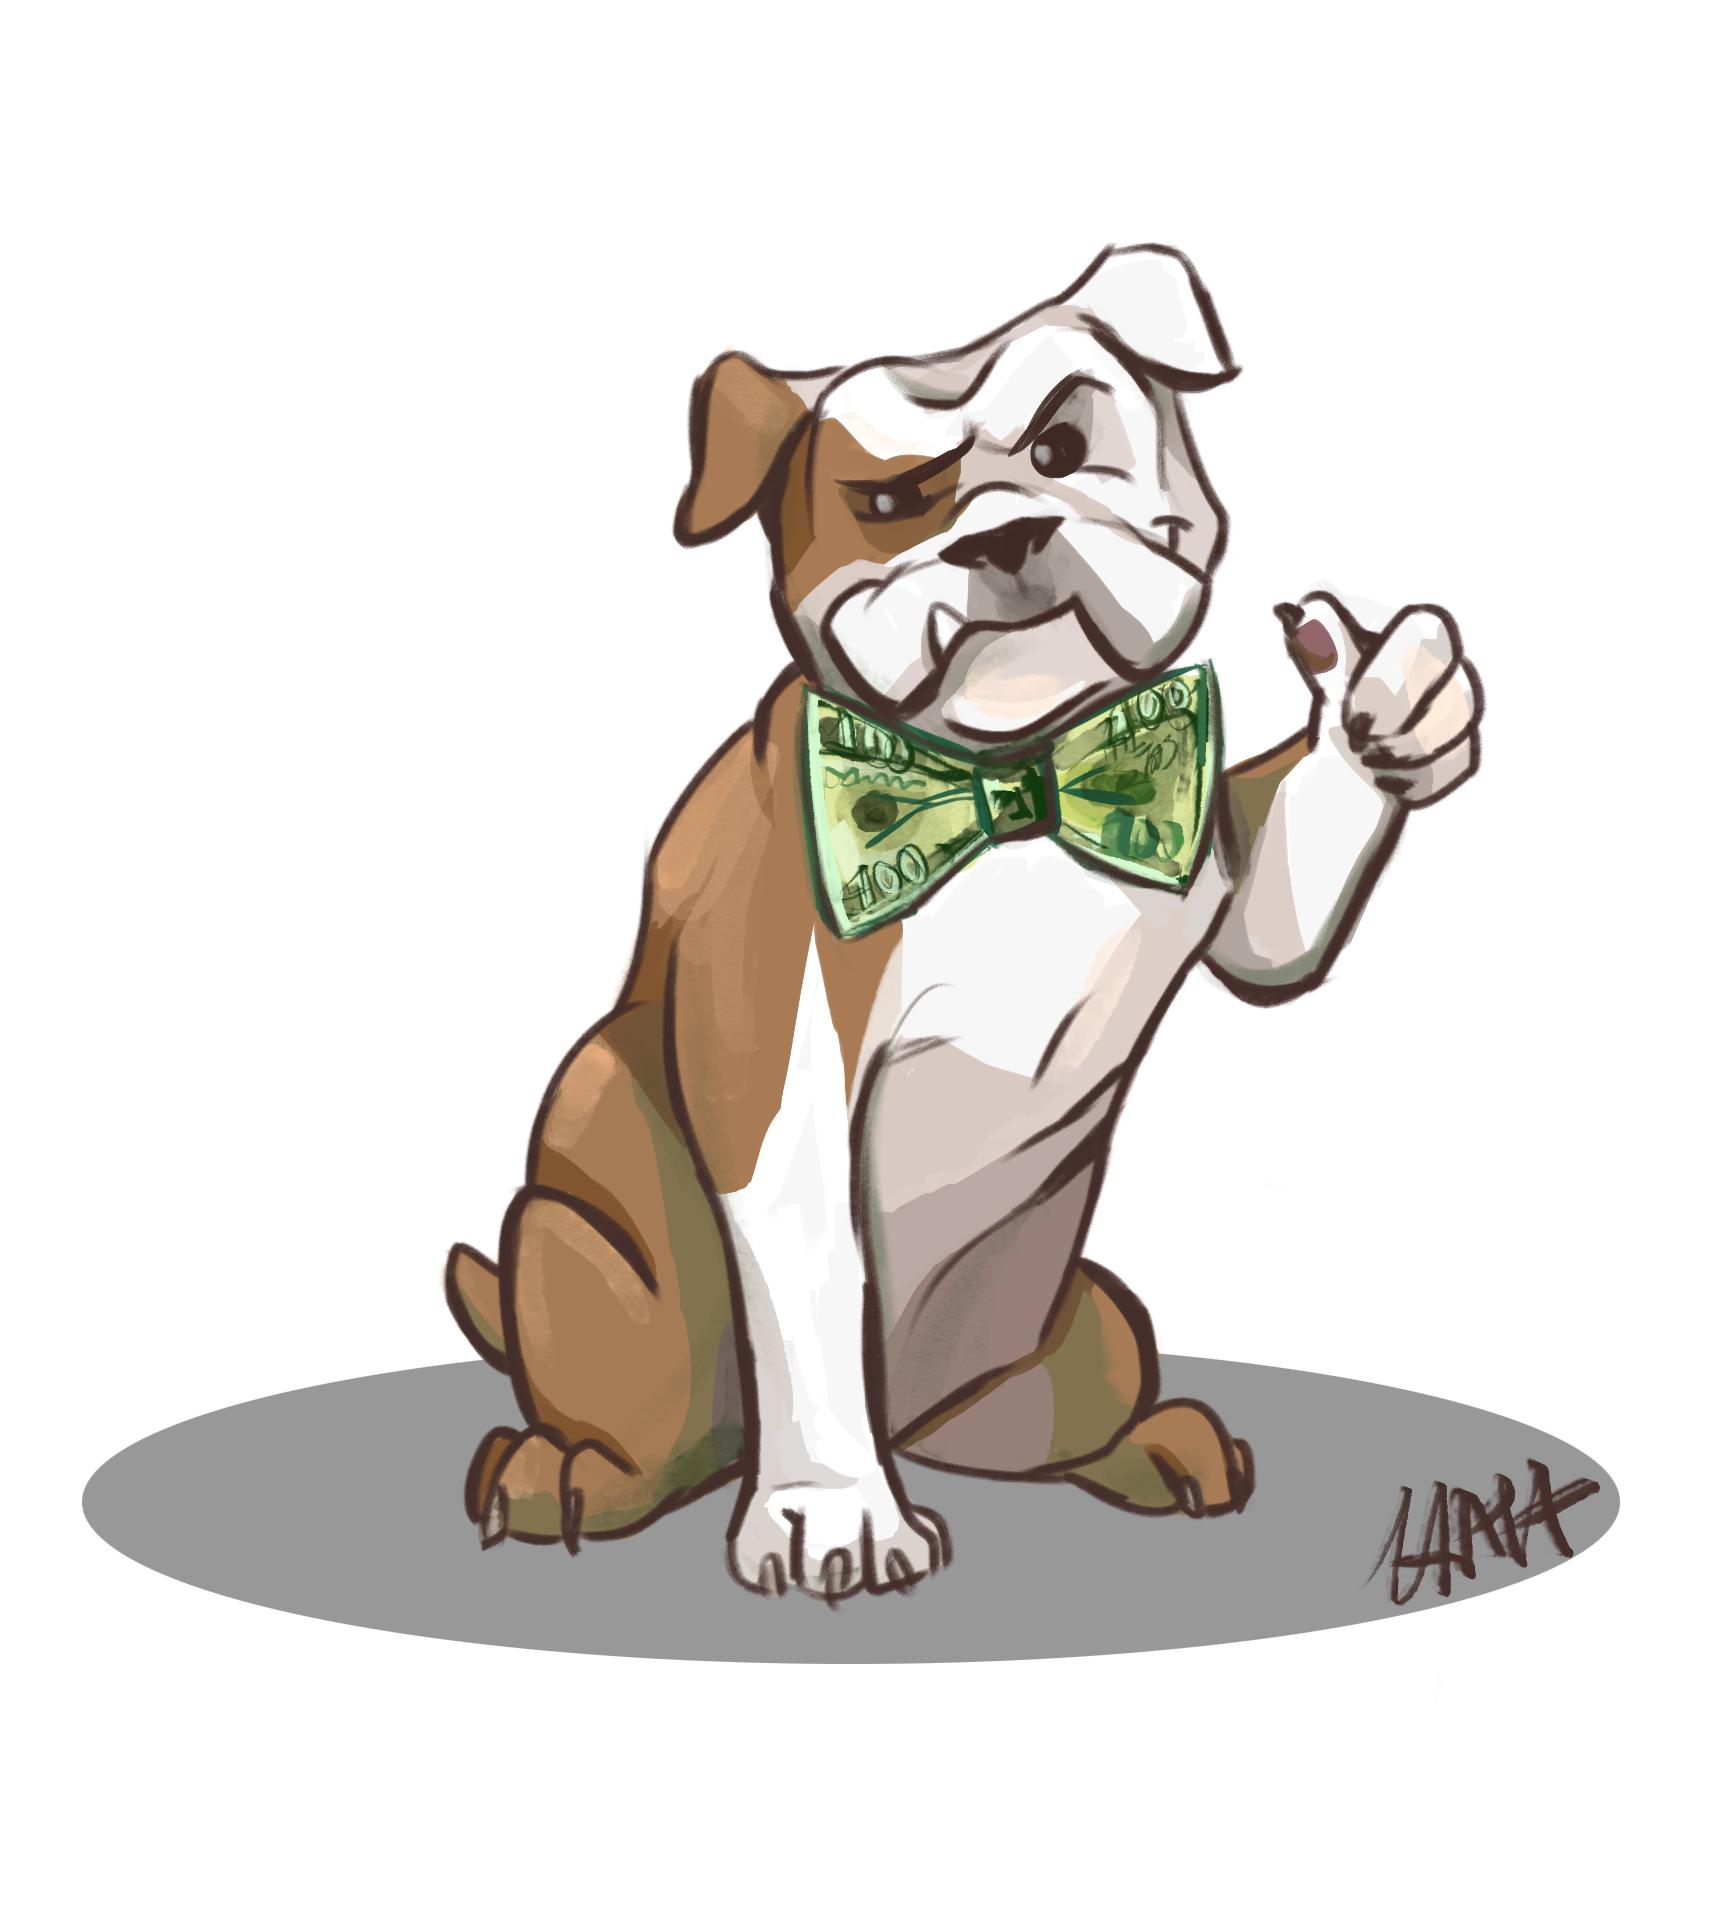 Mascot Design for Denial Management Department